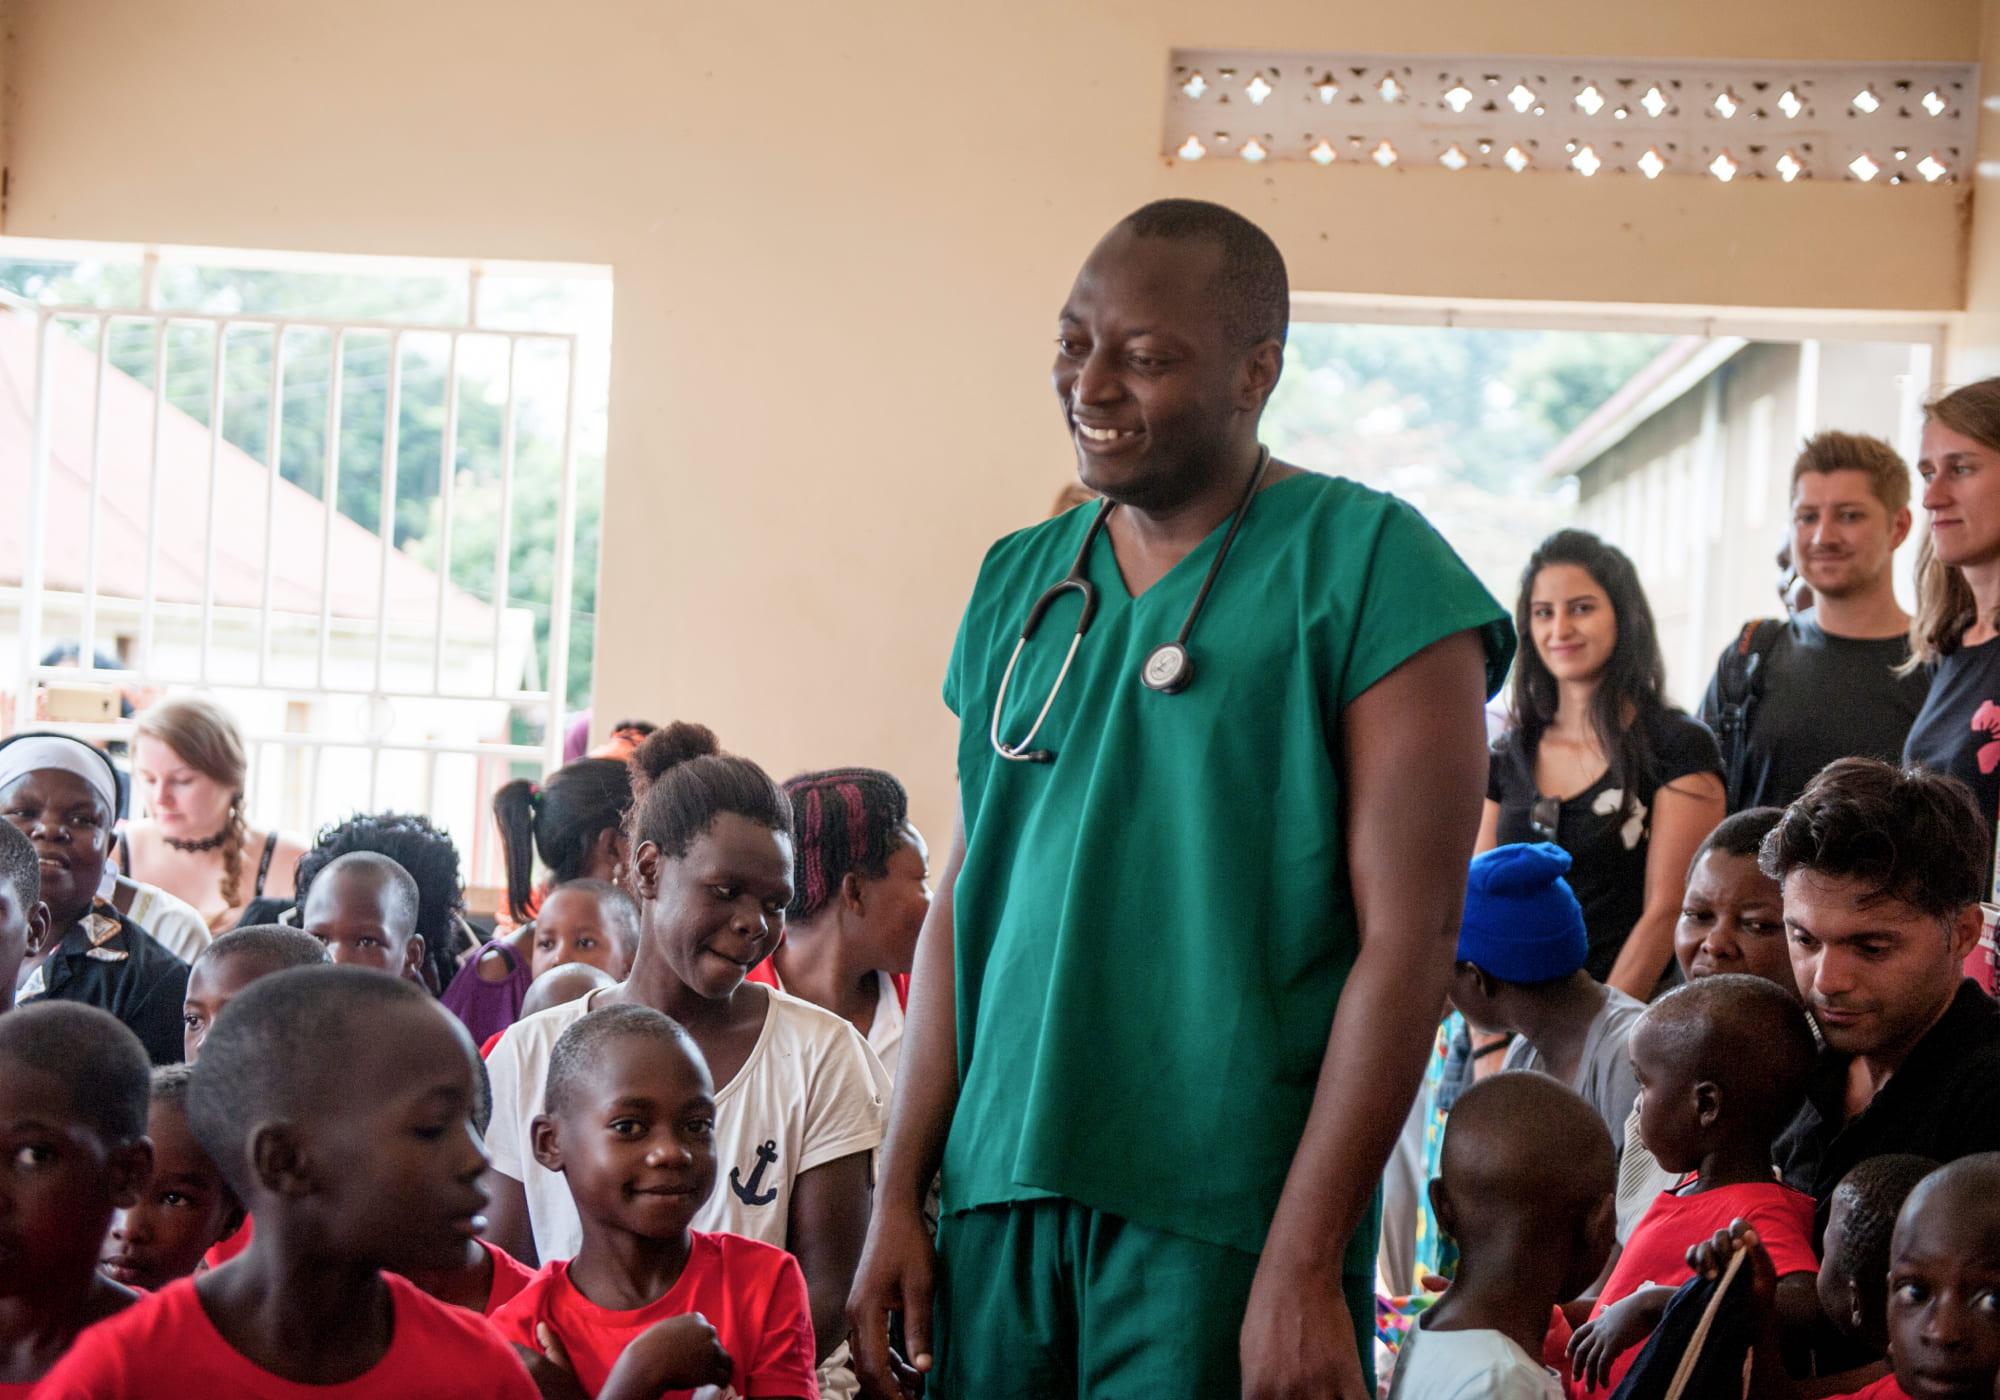 Enable training as a nurse